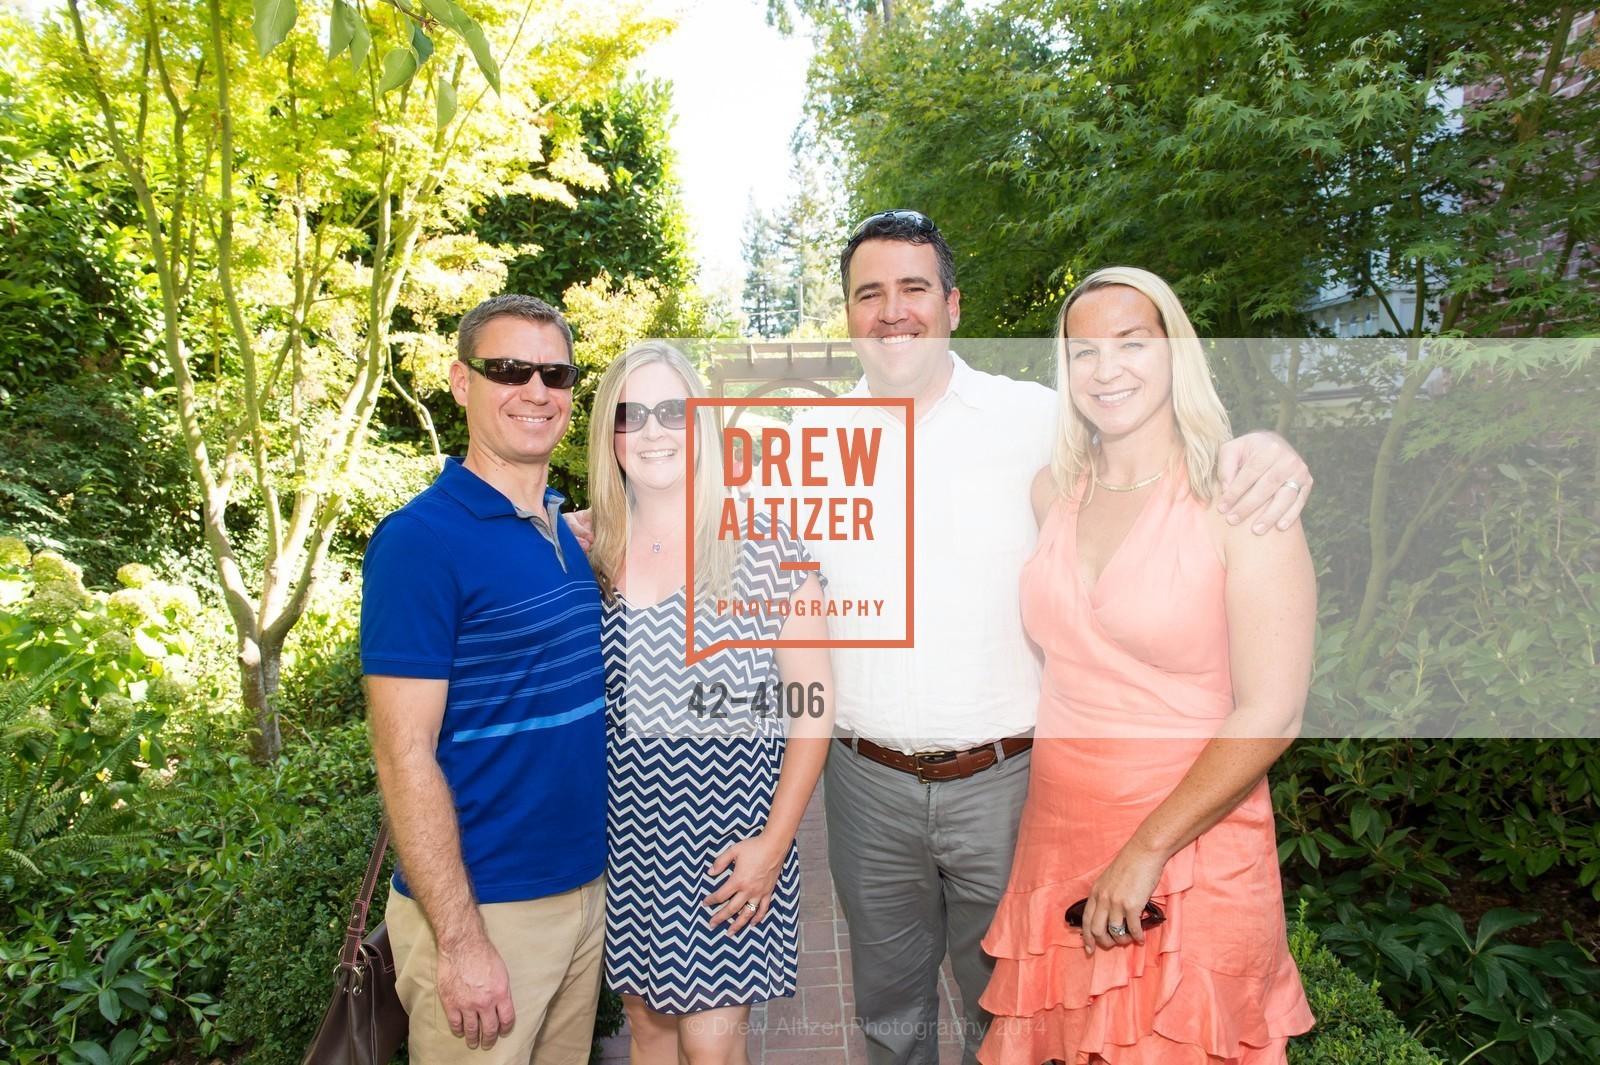 Colin Crawford, Nicole Crawford, Craig Crawford, Maggie Crawford, Photo #42-4106